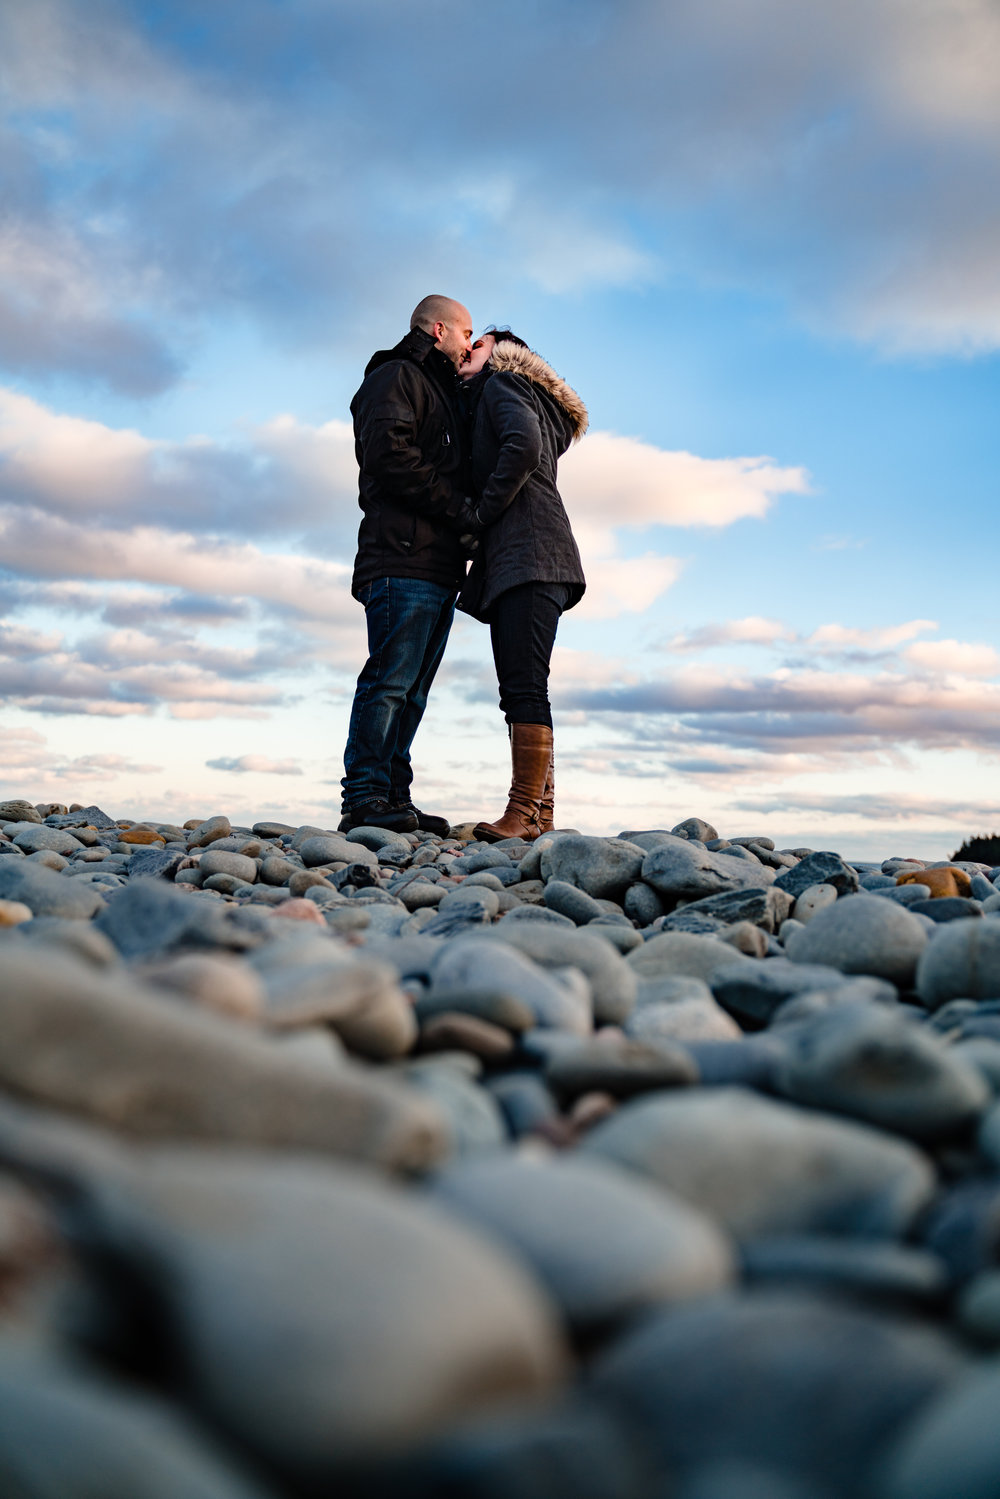 Sarah&Shayne-Halifax-engagement-weddingphotography-weddingphotographers-novascotia (28 of 41).jpg